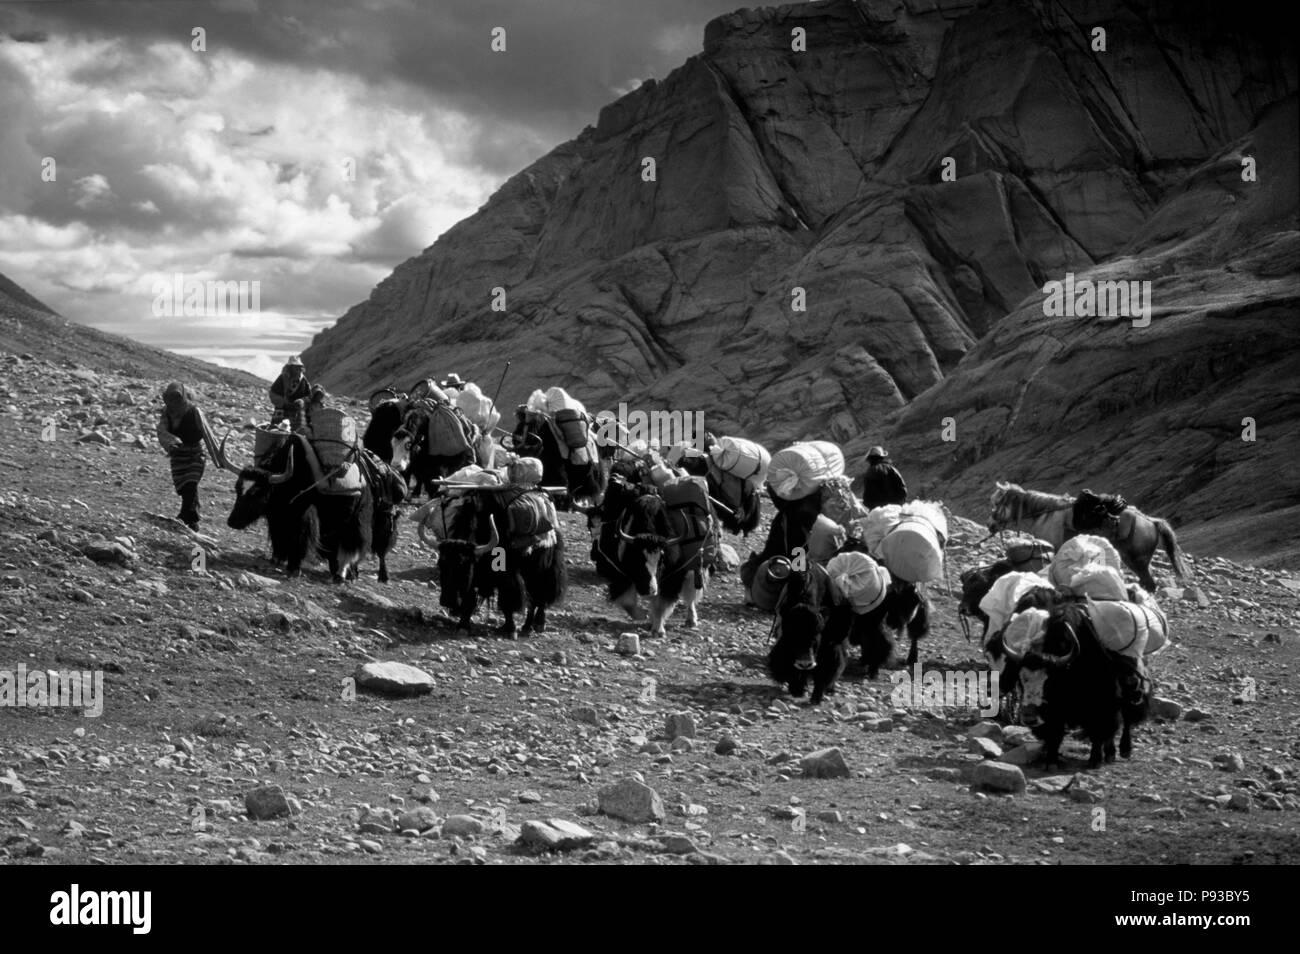 YAKS and PILGRIMS do KORA around MOUNT KAILASH (6638 METERS) the most sacred HIMALAYAN PEAK - TIBET - Stock Image